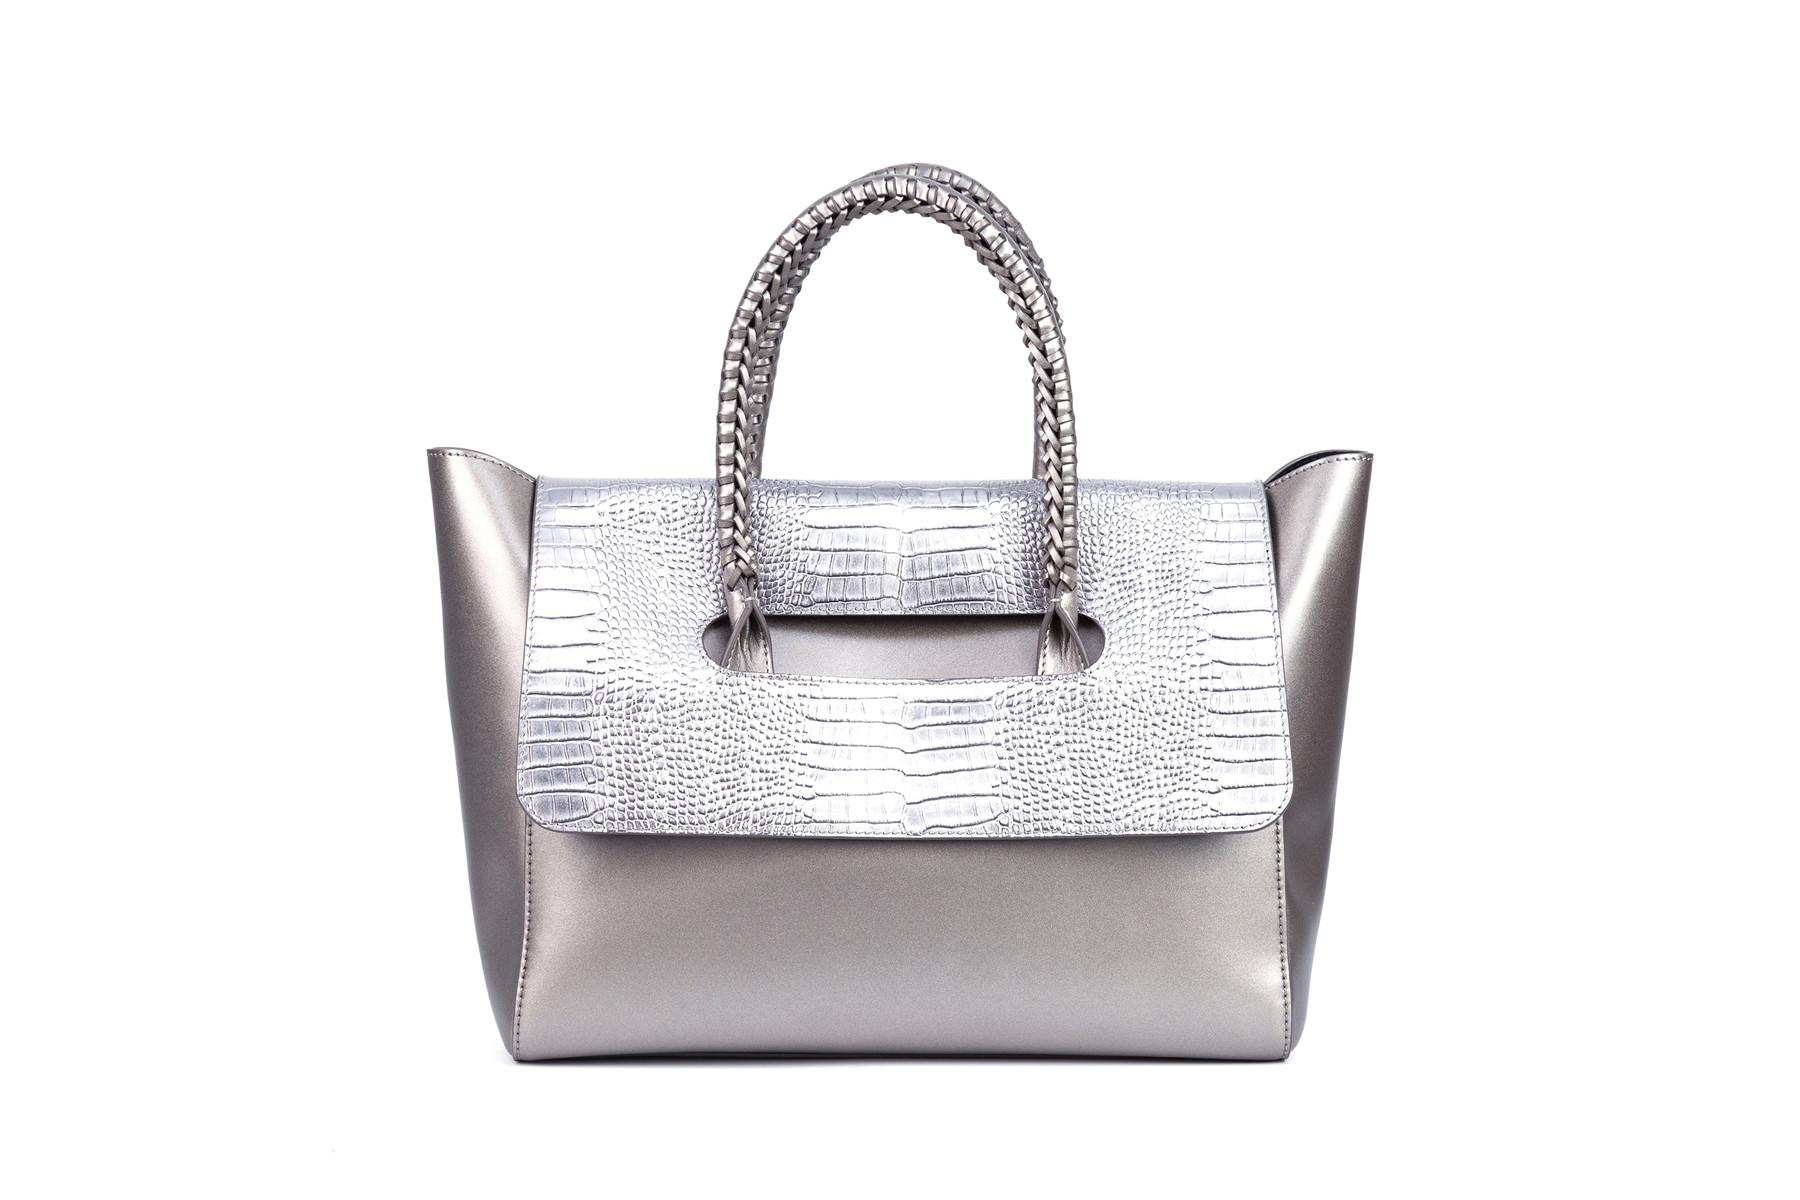 GF bags-Bulk Luxury Handbags Manufacturer, Affordable Handbags   Gf Bags